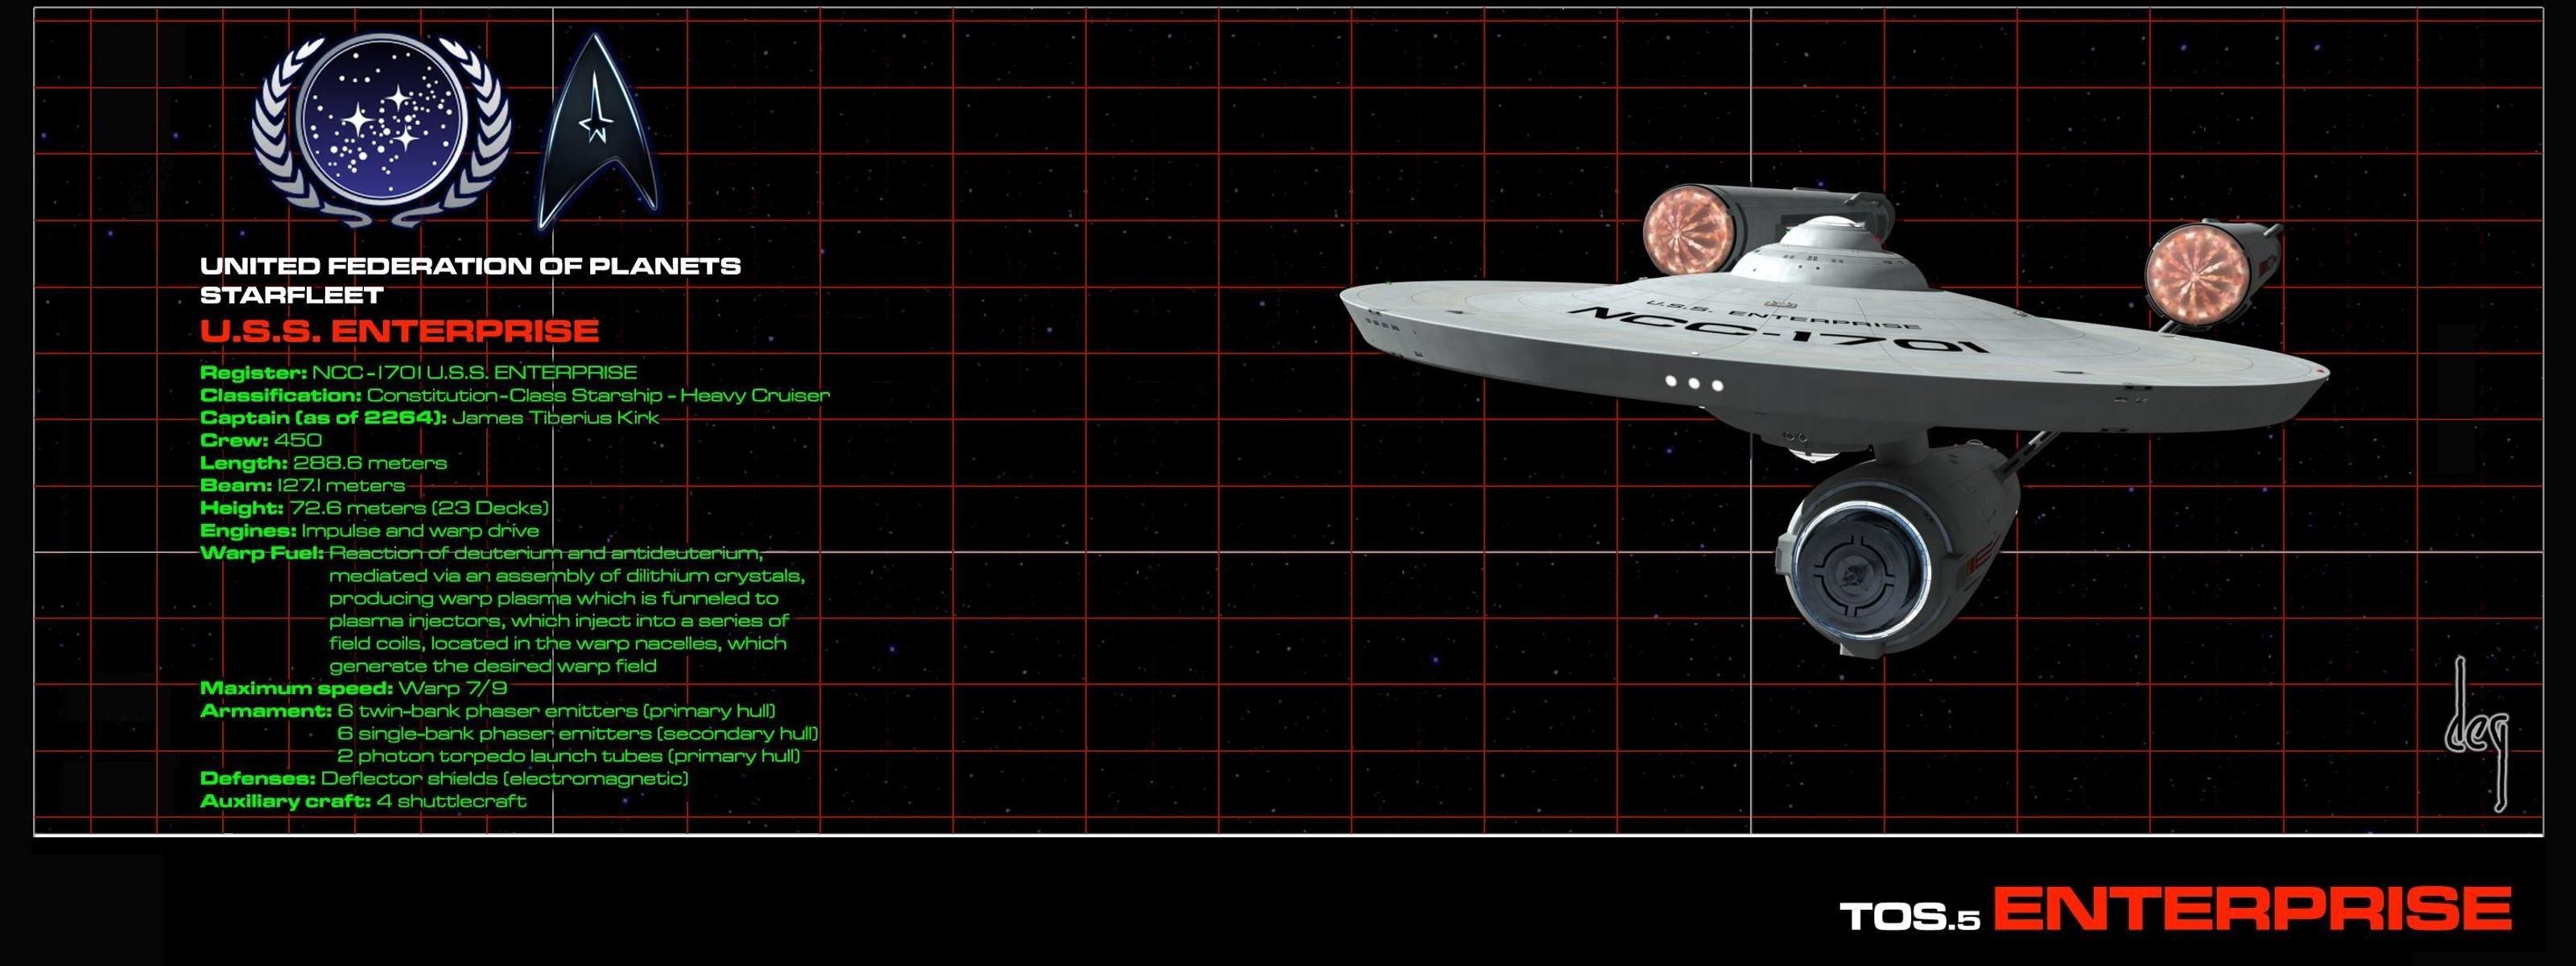 Dual Monitor Star Trek Wallpapers Hd Backgrounds